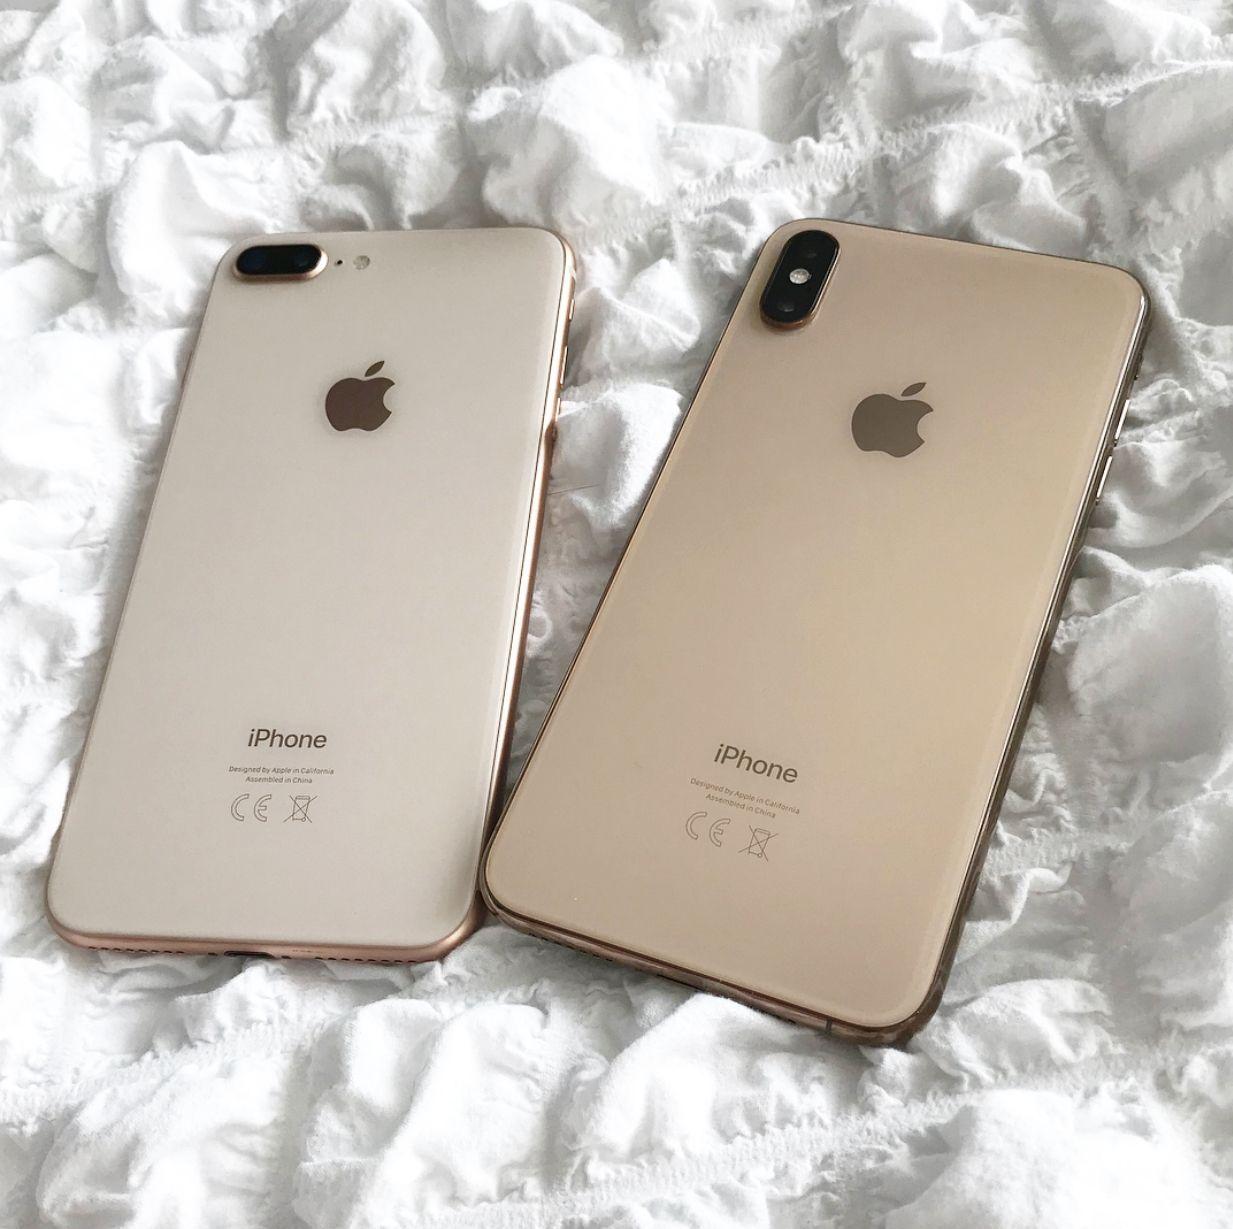 Iphonephotography Iphonexs Iphonexsmax Apple Iphone8plus Ipad Macbook Iphonepics Applewatch Ineedthisshi Apple Phone Case Iphone Cases Apple Products